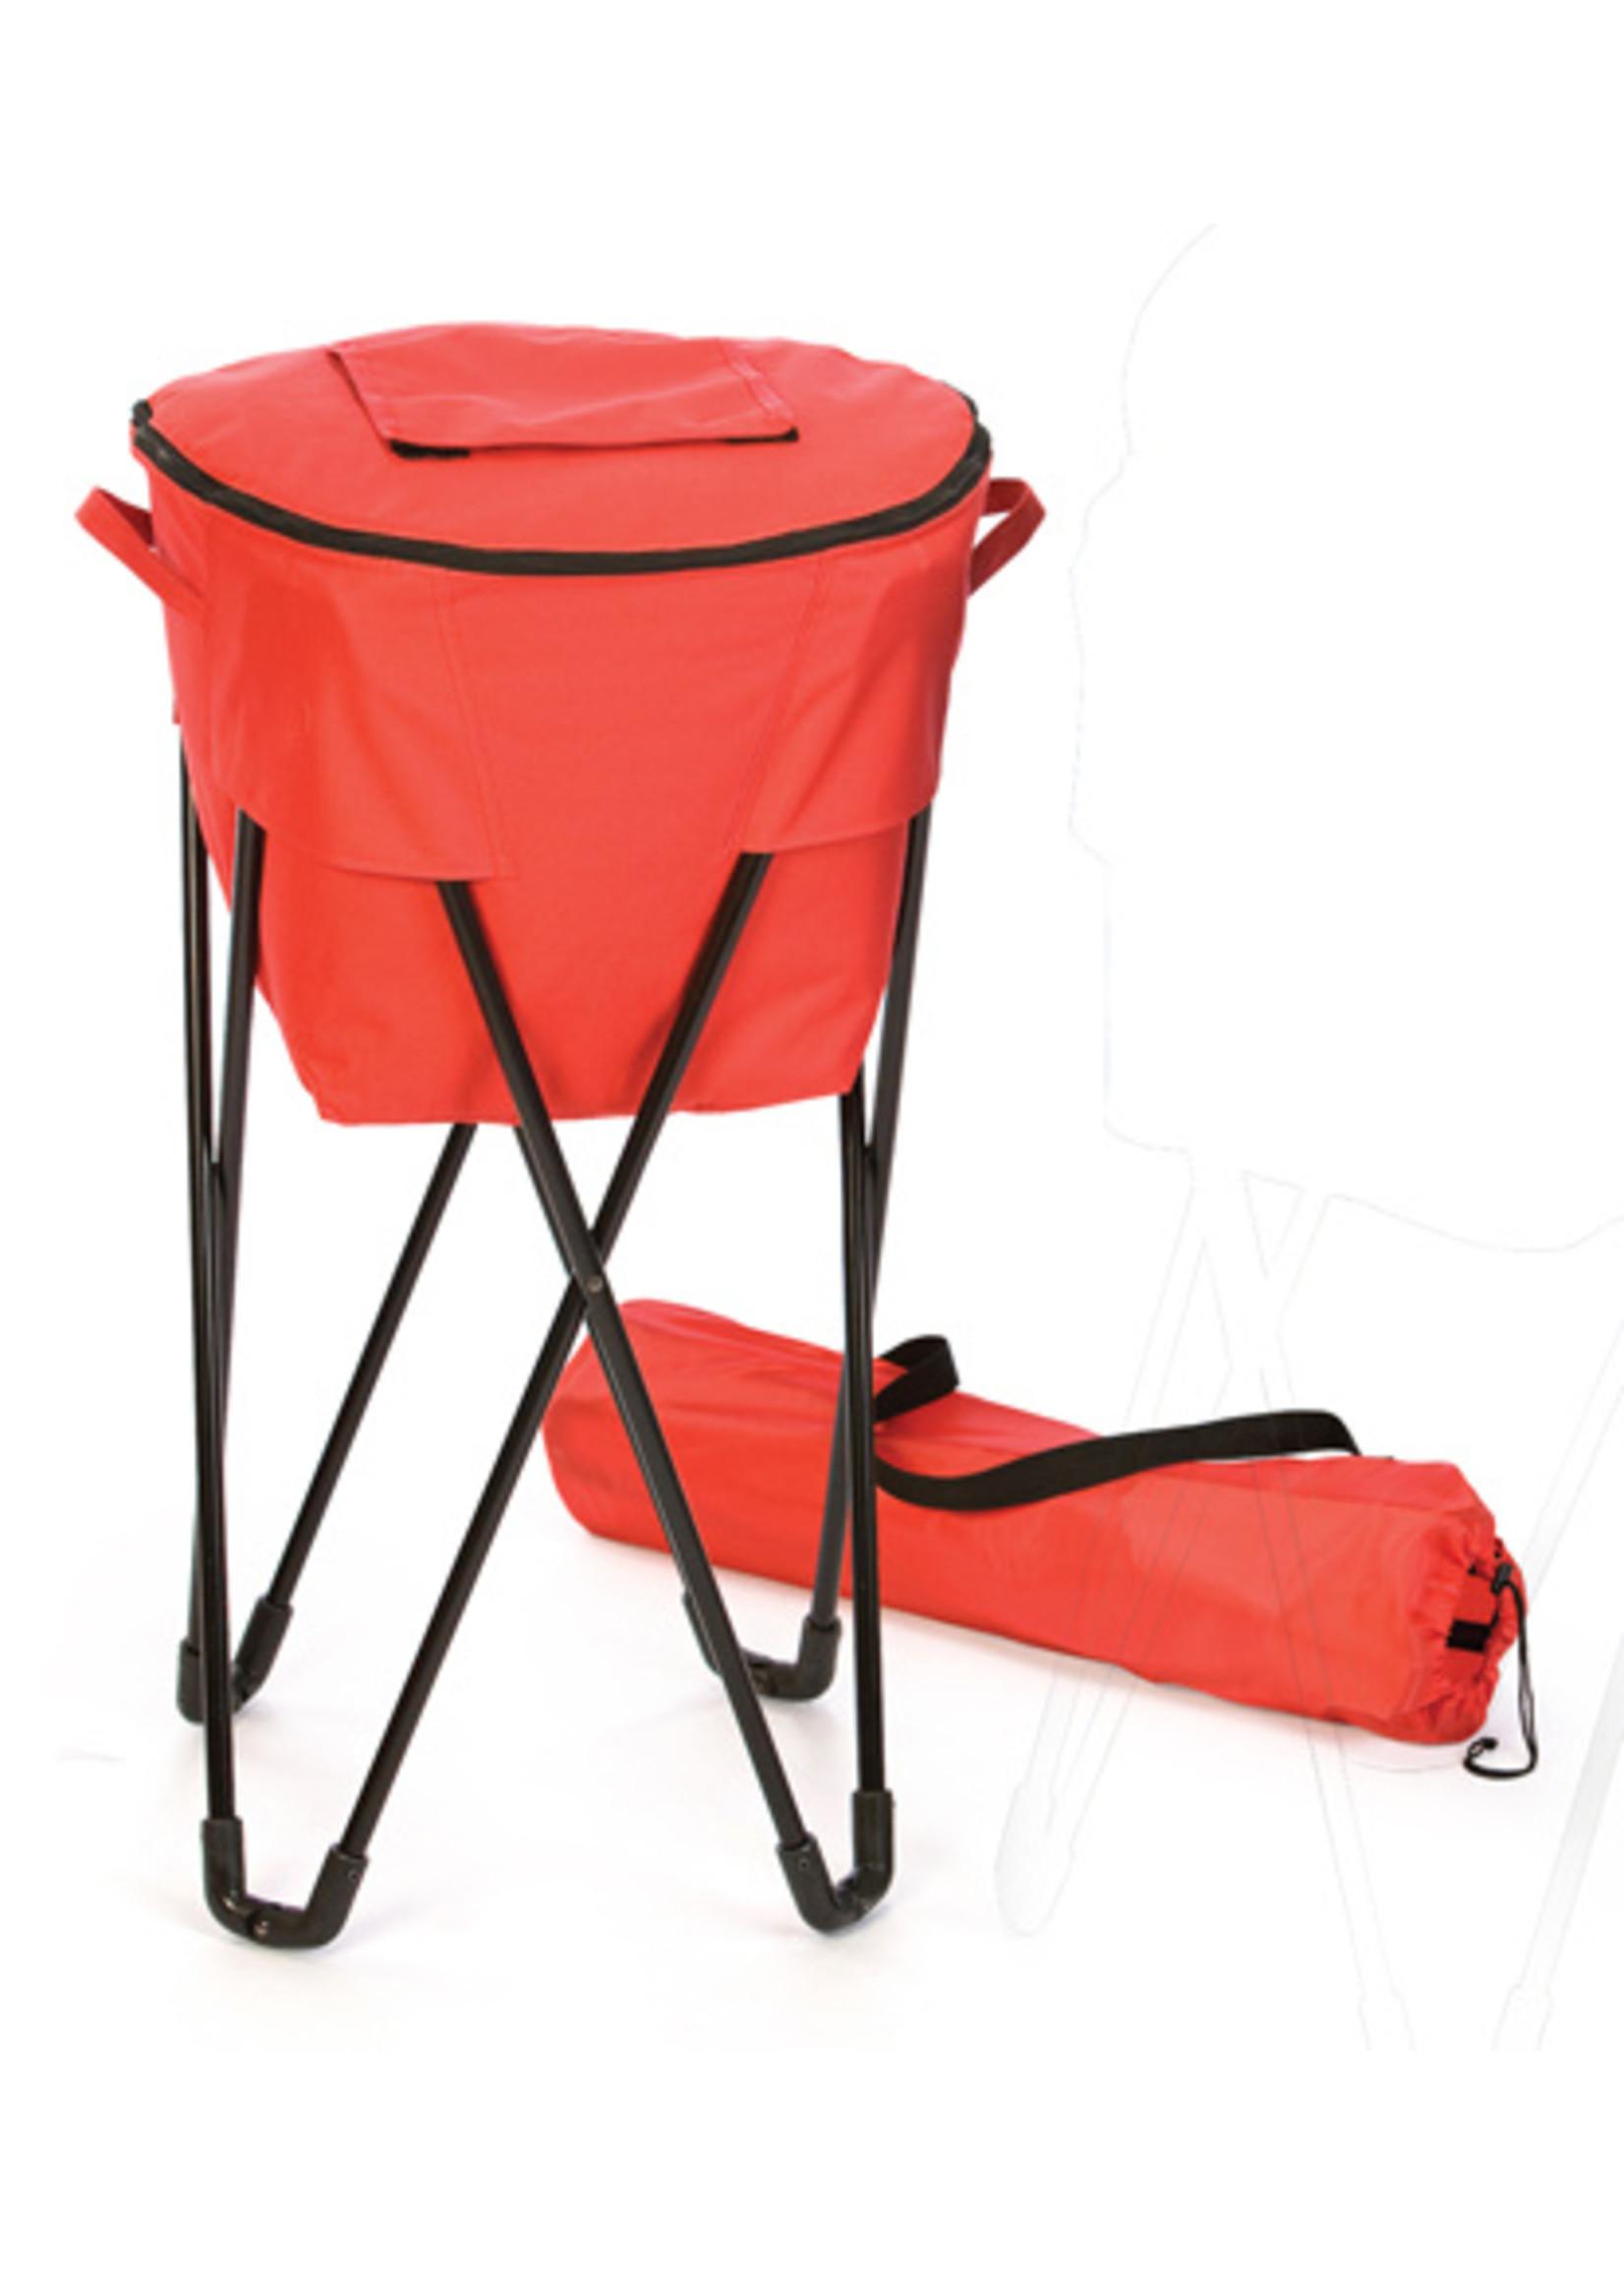 Oak & Olive/Picnic Plus Tub Cooler - Red